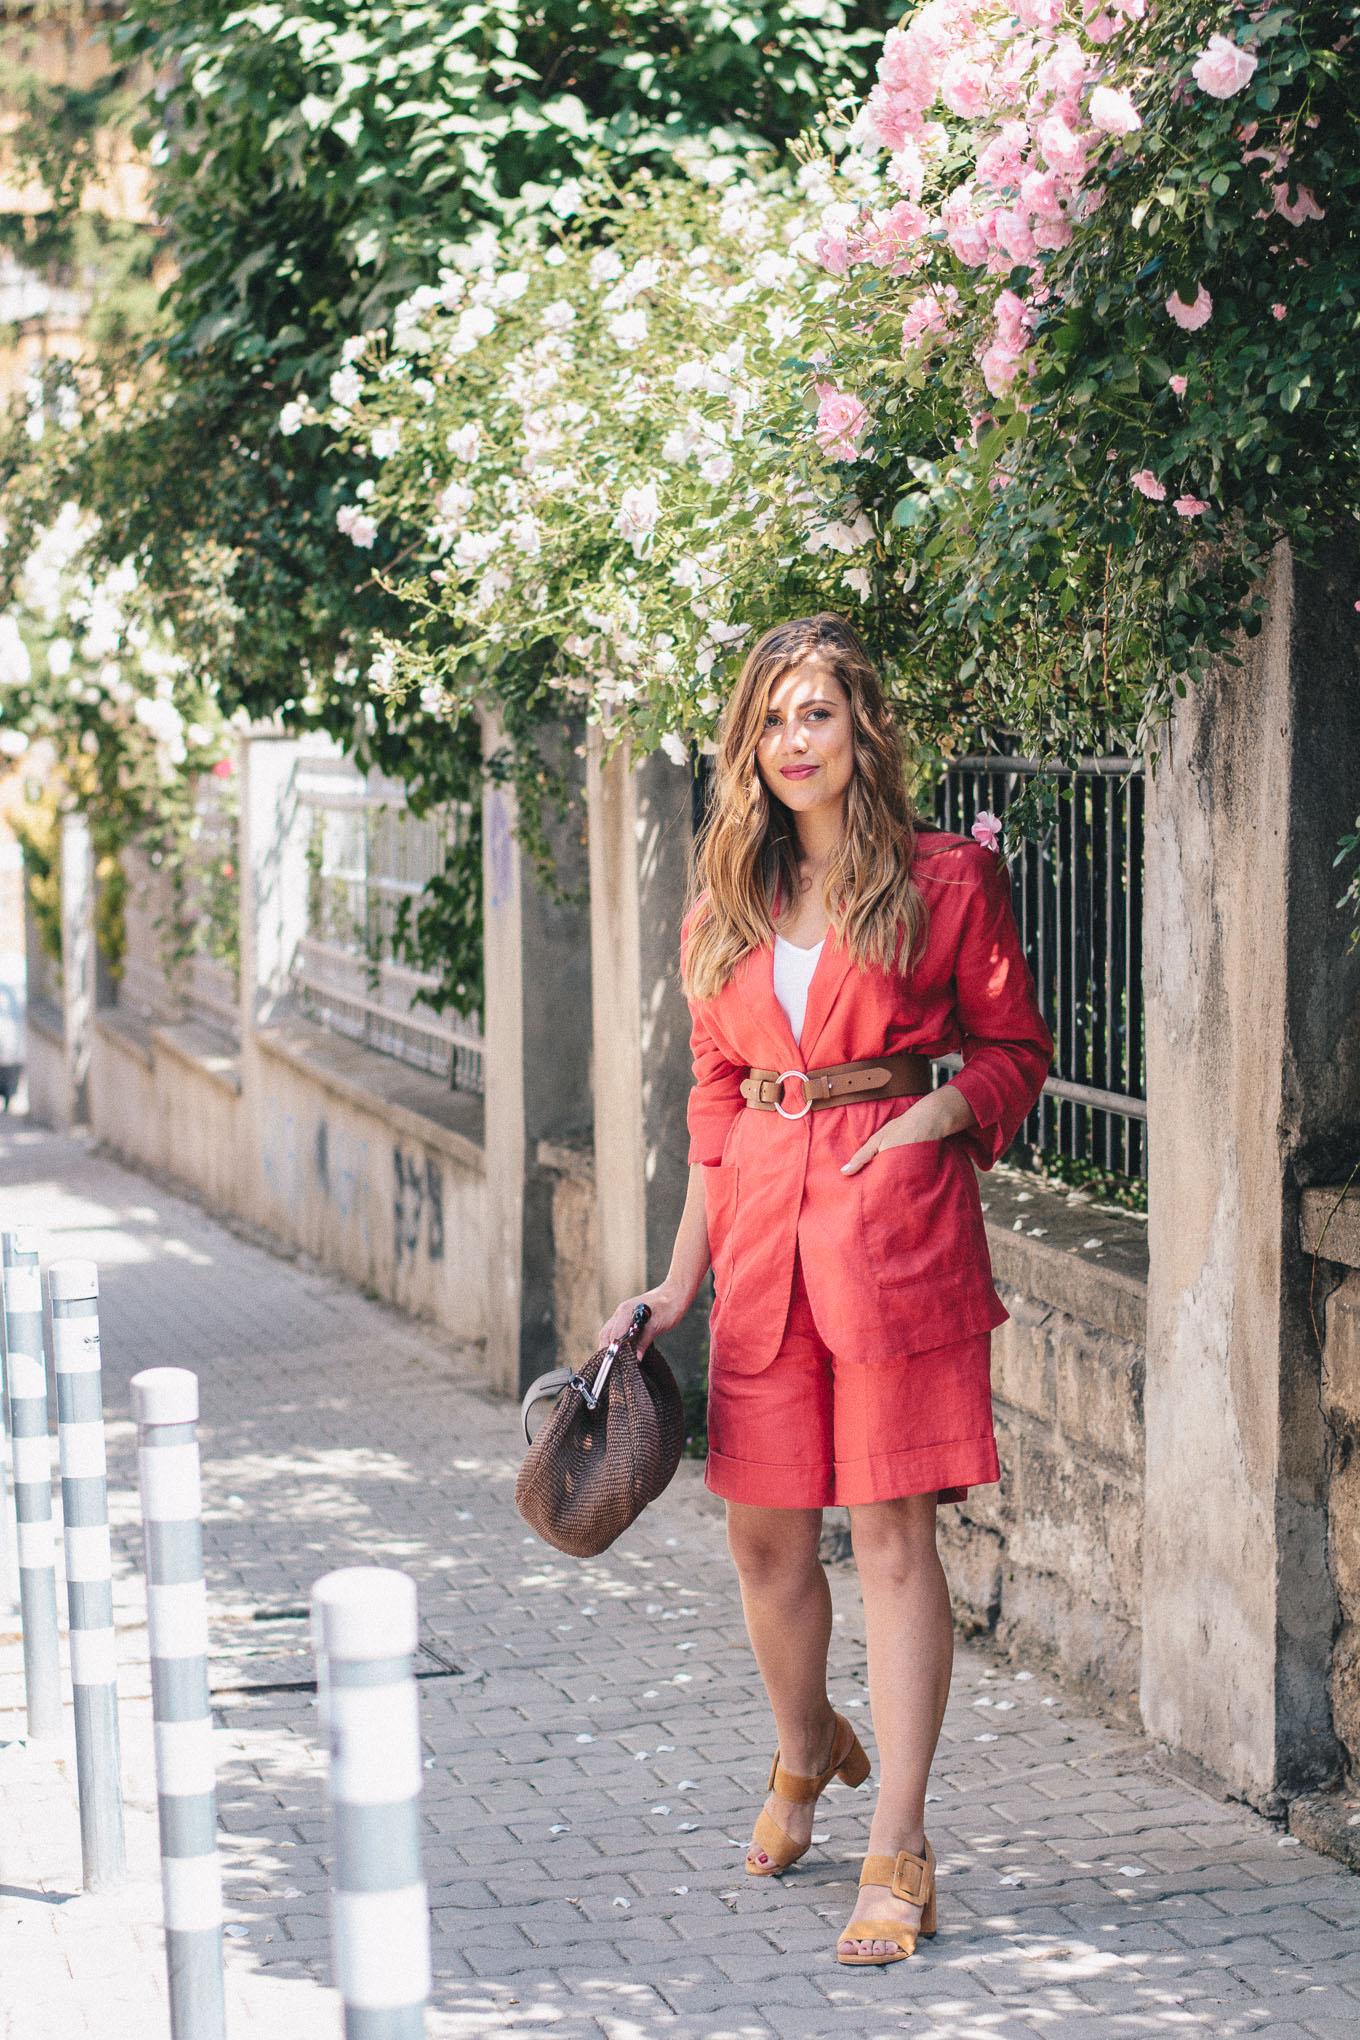 Benetton summer styling